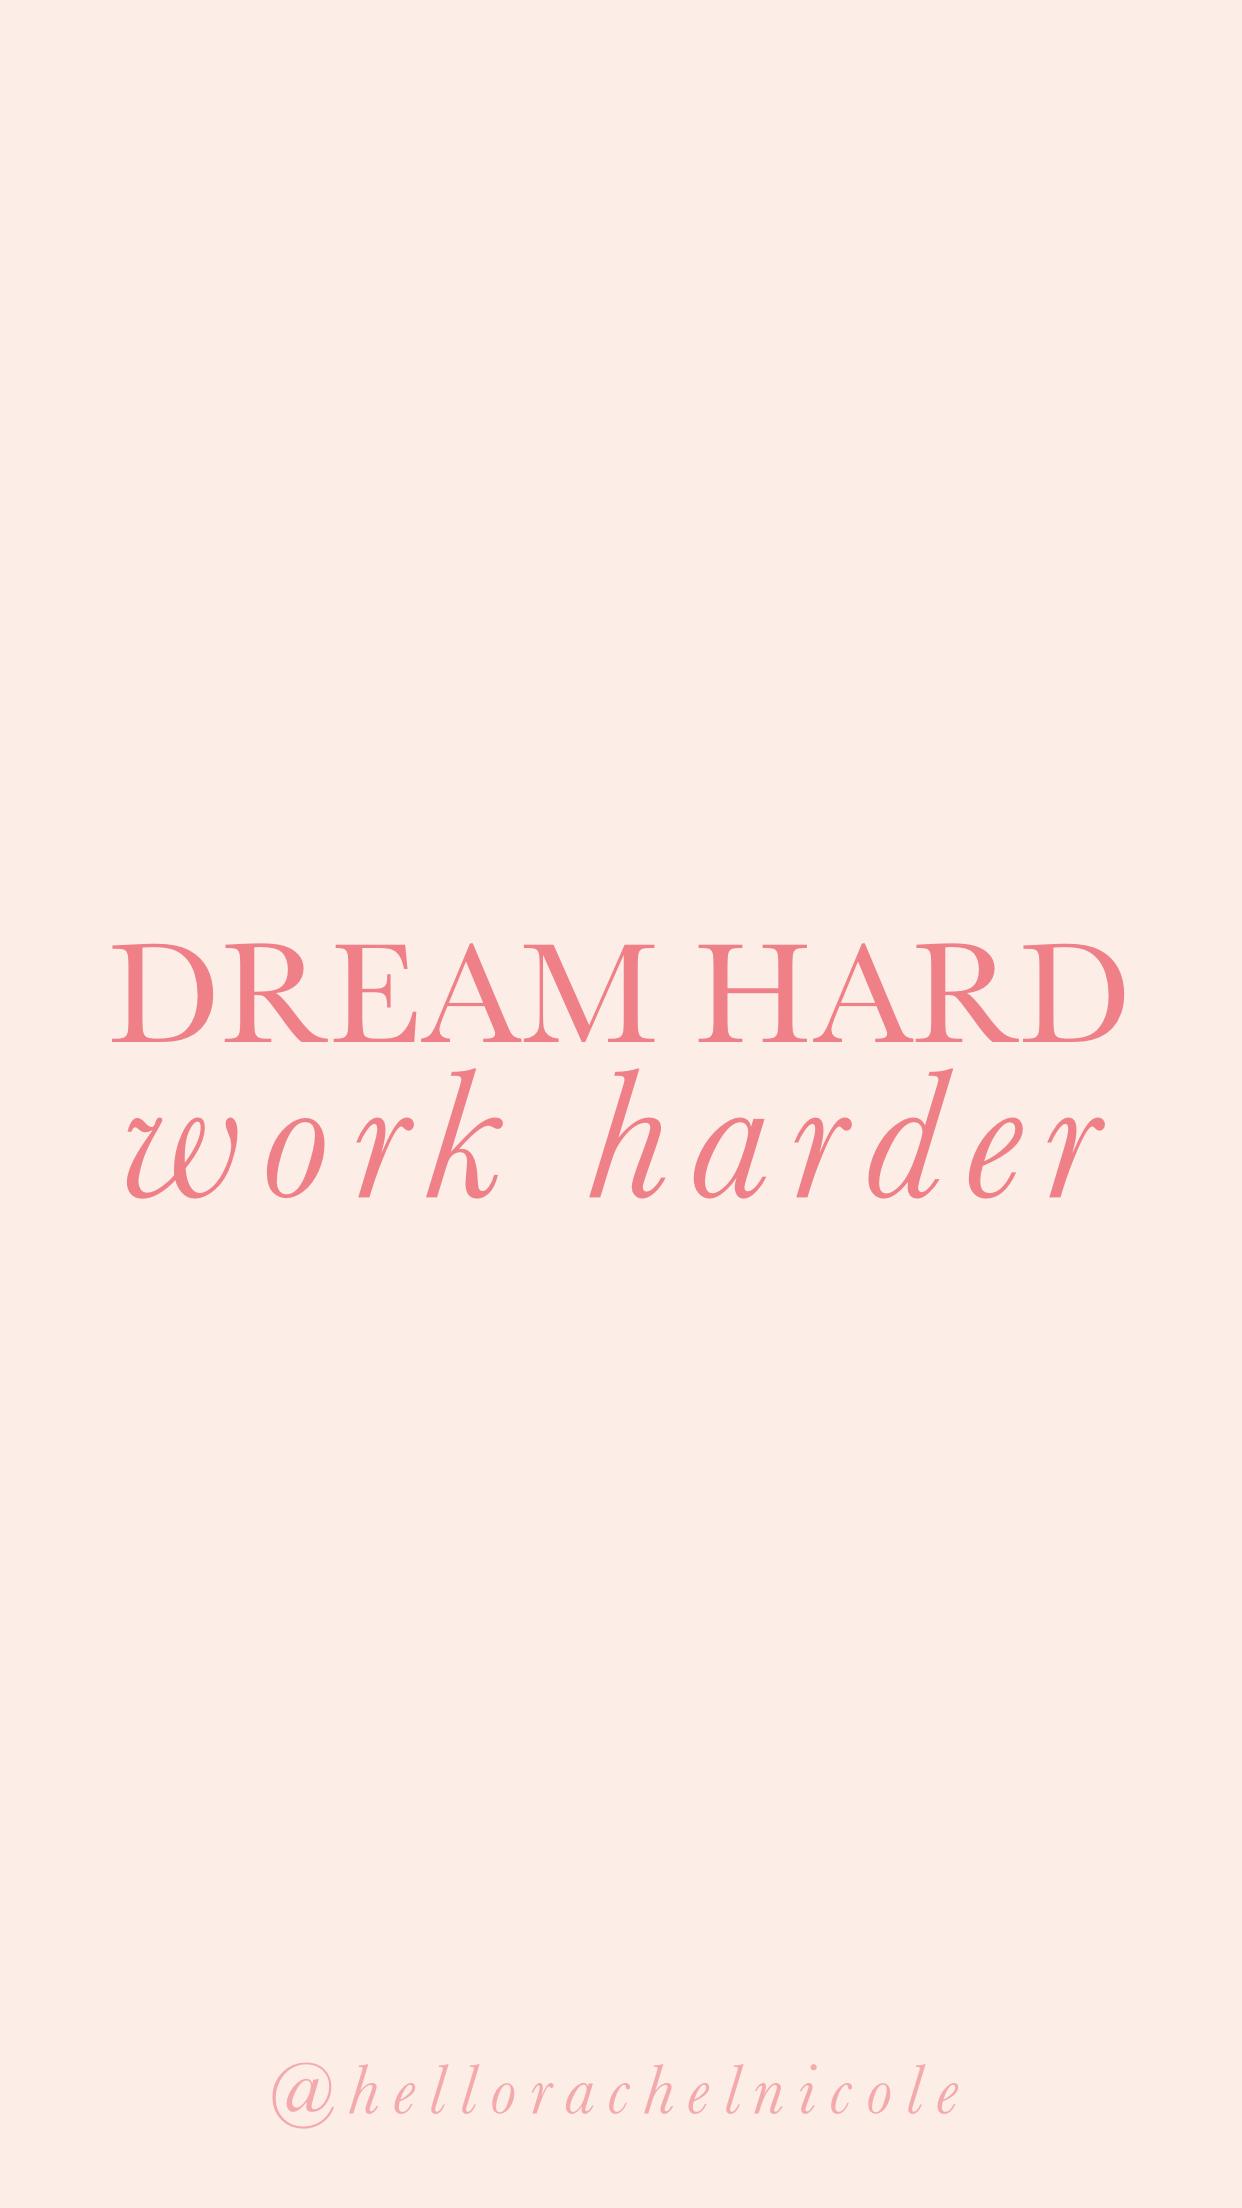 Dream Hard Work Harder Rachel Nicole Designs Work Quotes Funny Hard Work Quotes Work Quotes